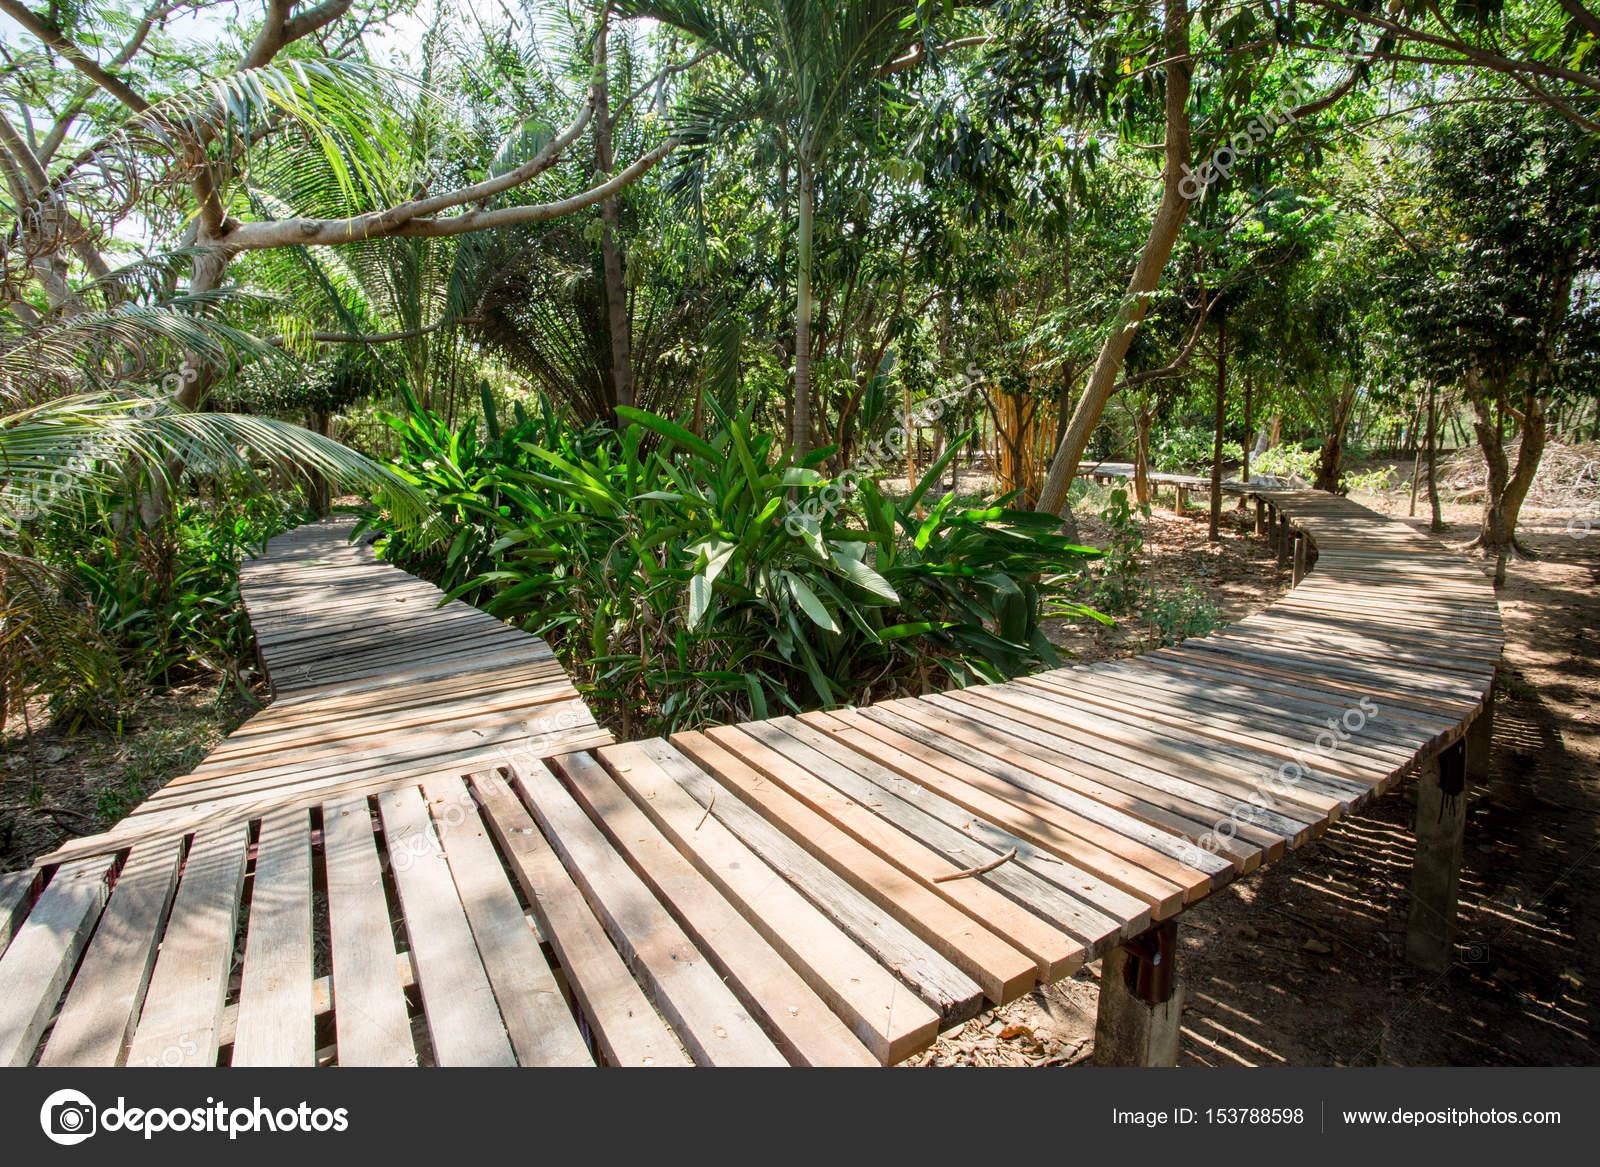 Holz Brücke Im Garten Stockfoto Sirikornt 153788598